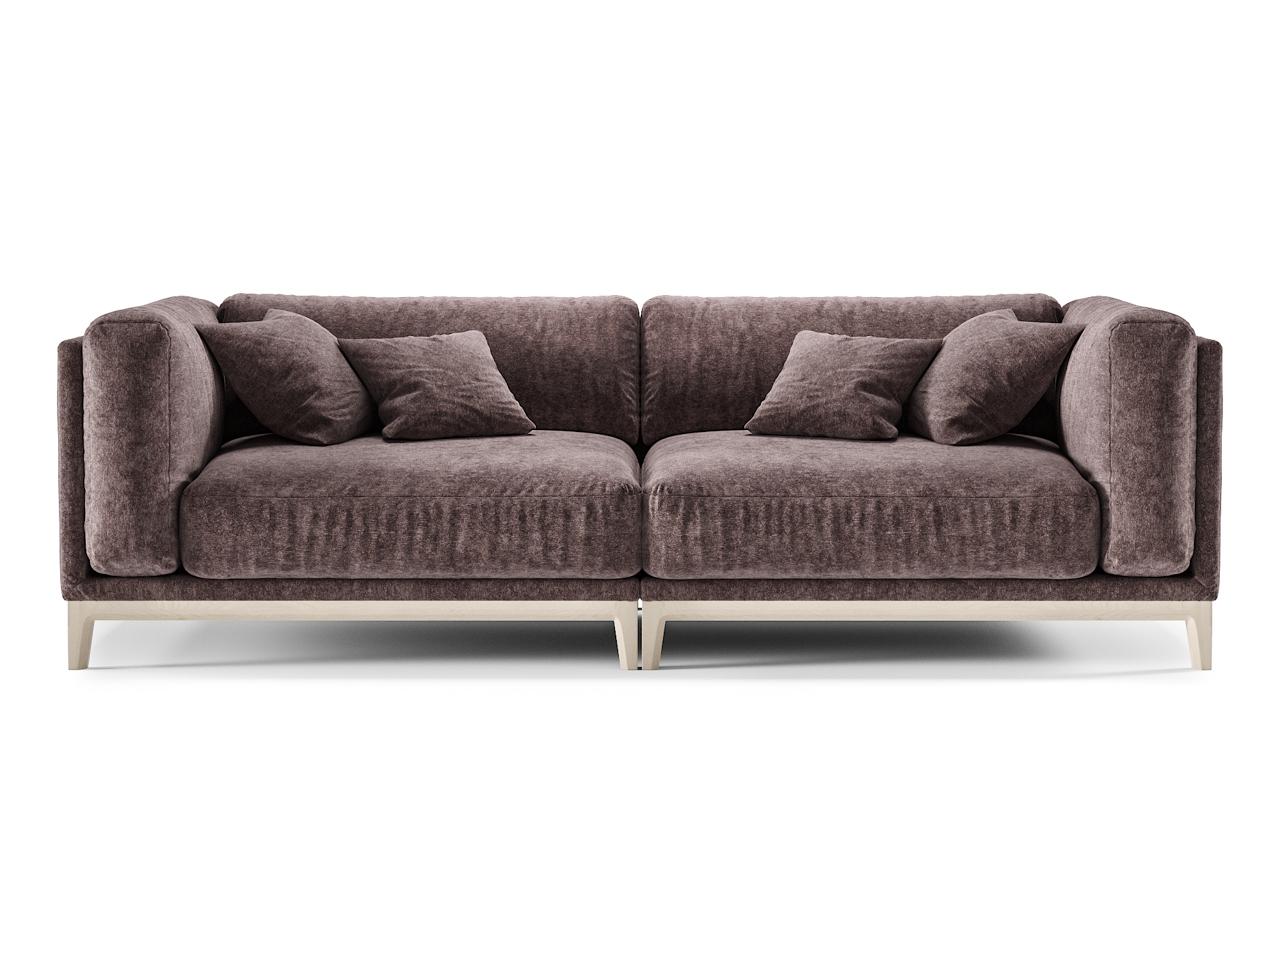 The idea диван case коричневый 108432/108453